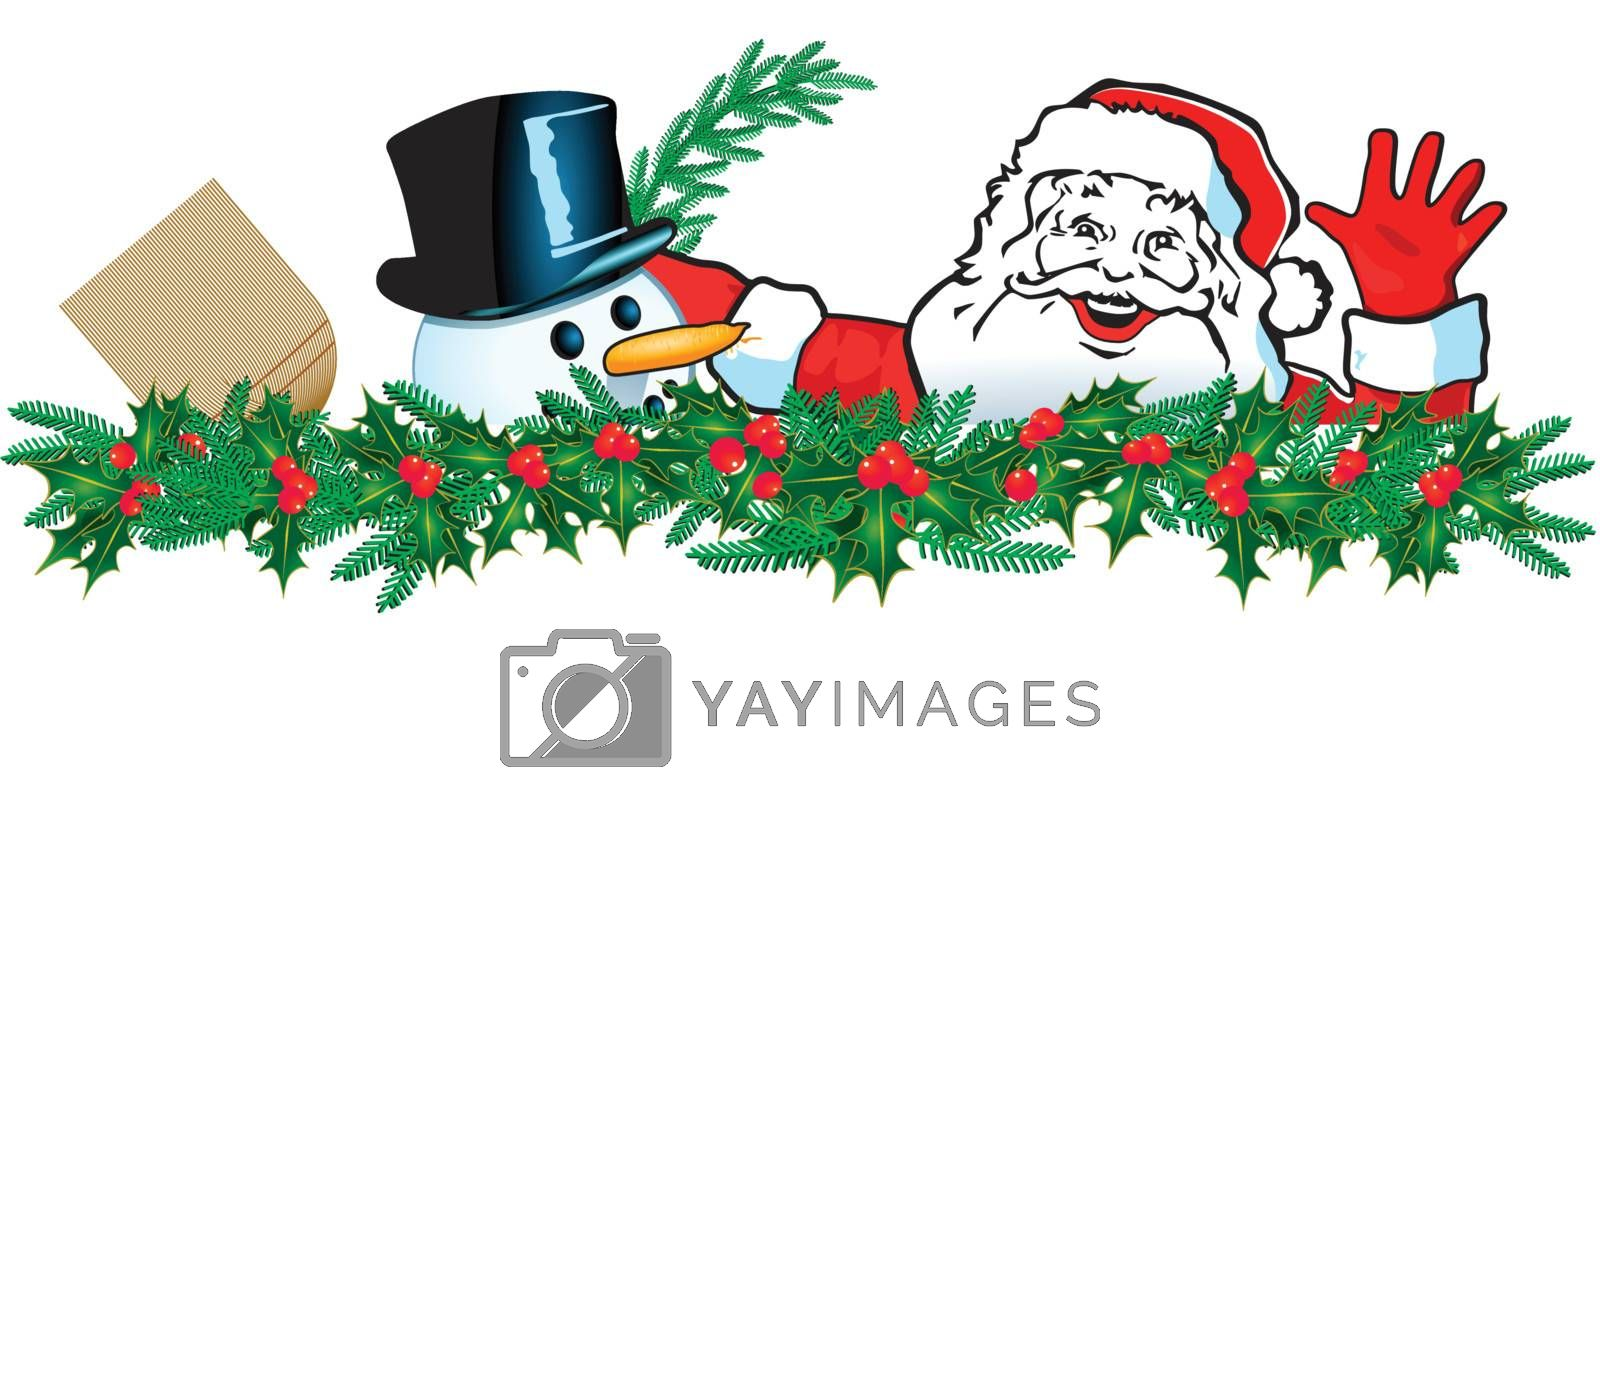 Greetings from Santa Claus